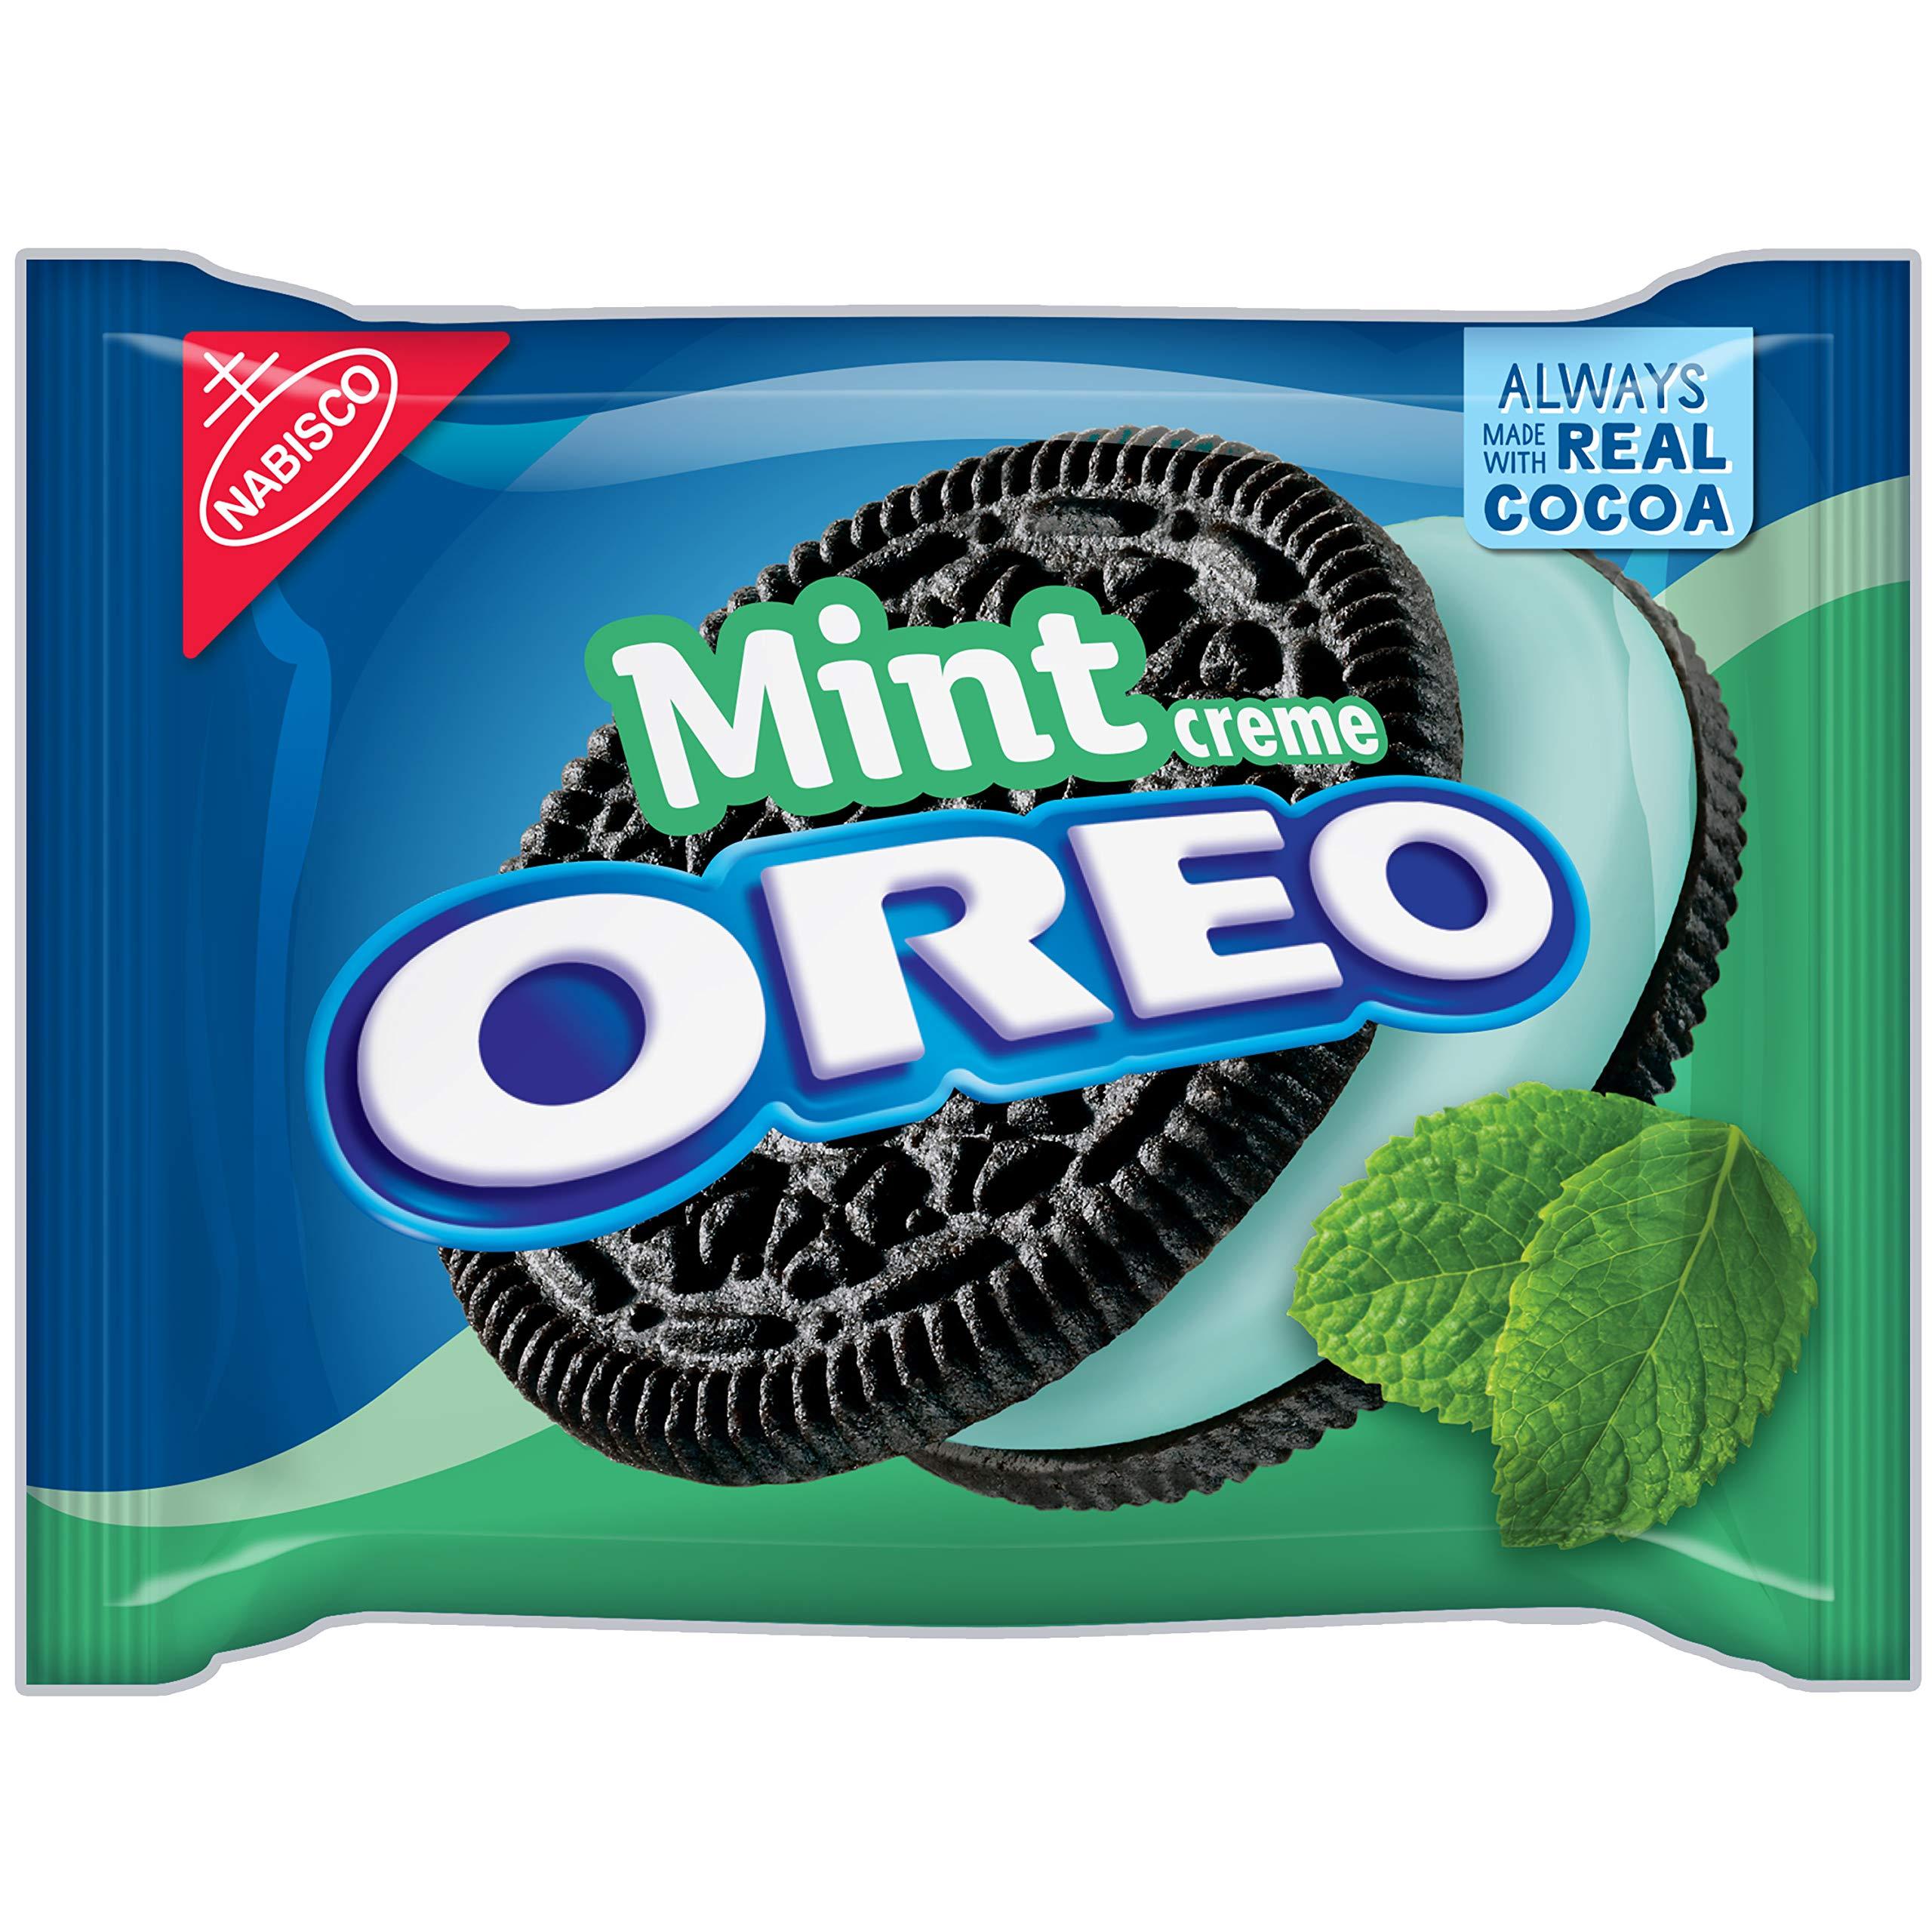 OREO Mint Creme Chocolate Sandwich Cookies, 15.2 oz